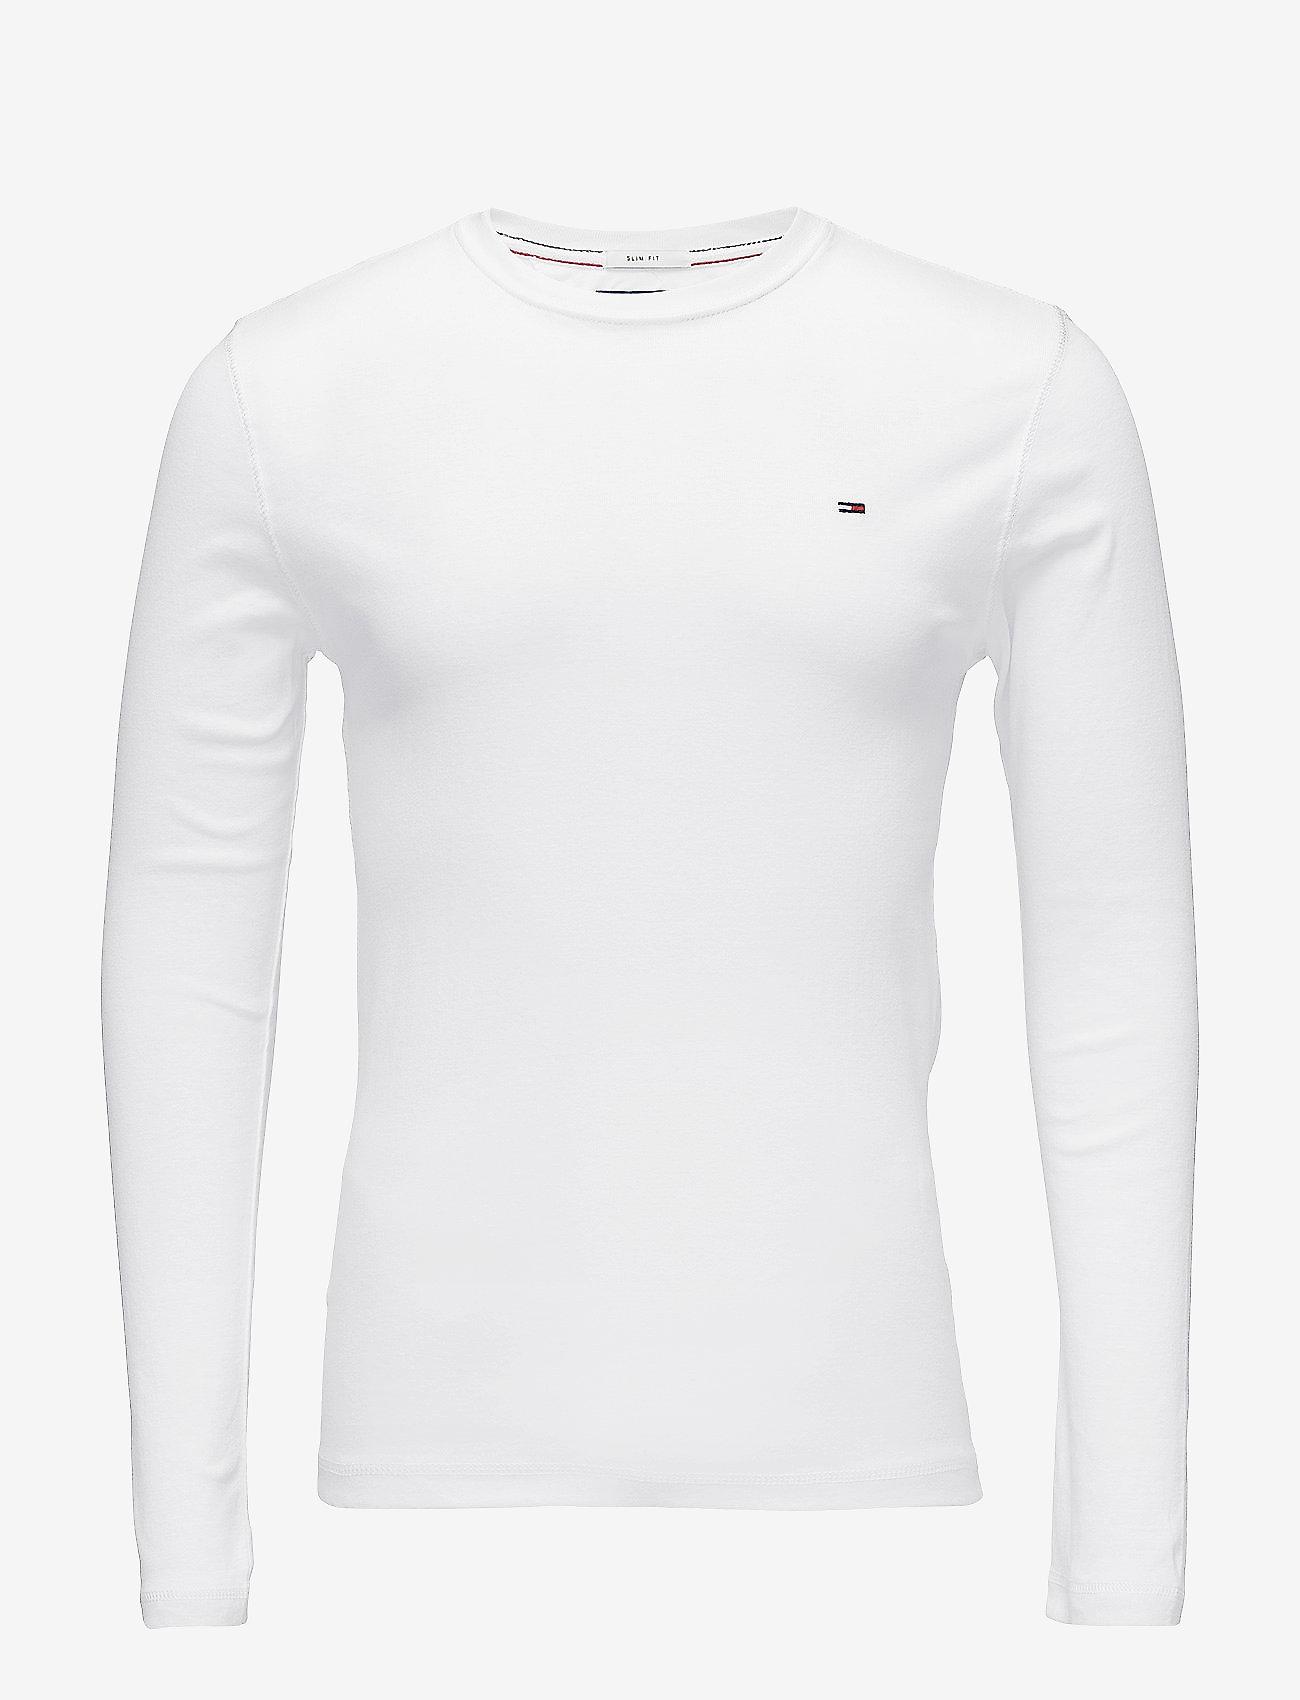 Tommy Jeans - TJM ORIGINAL RIB LONGSLEEVE TEE - basic t-shirts - classic white - 0